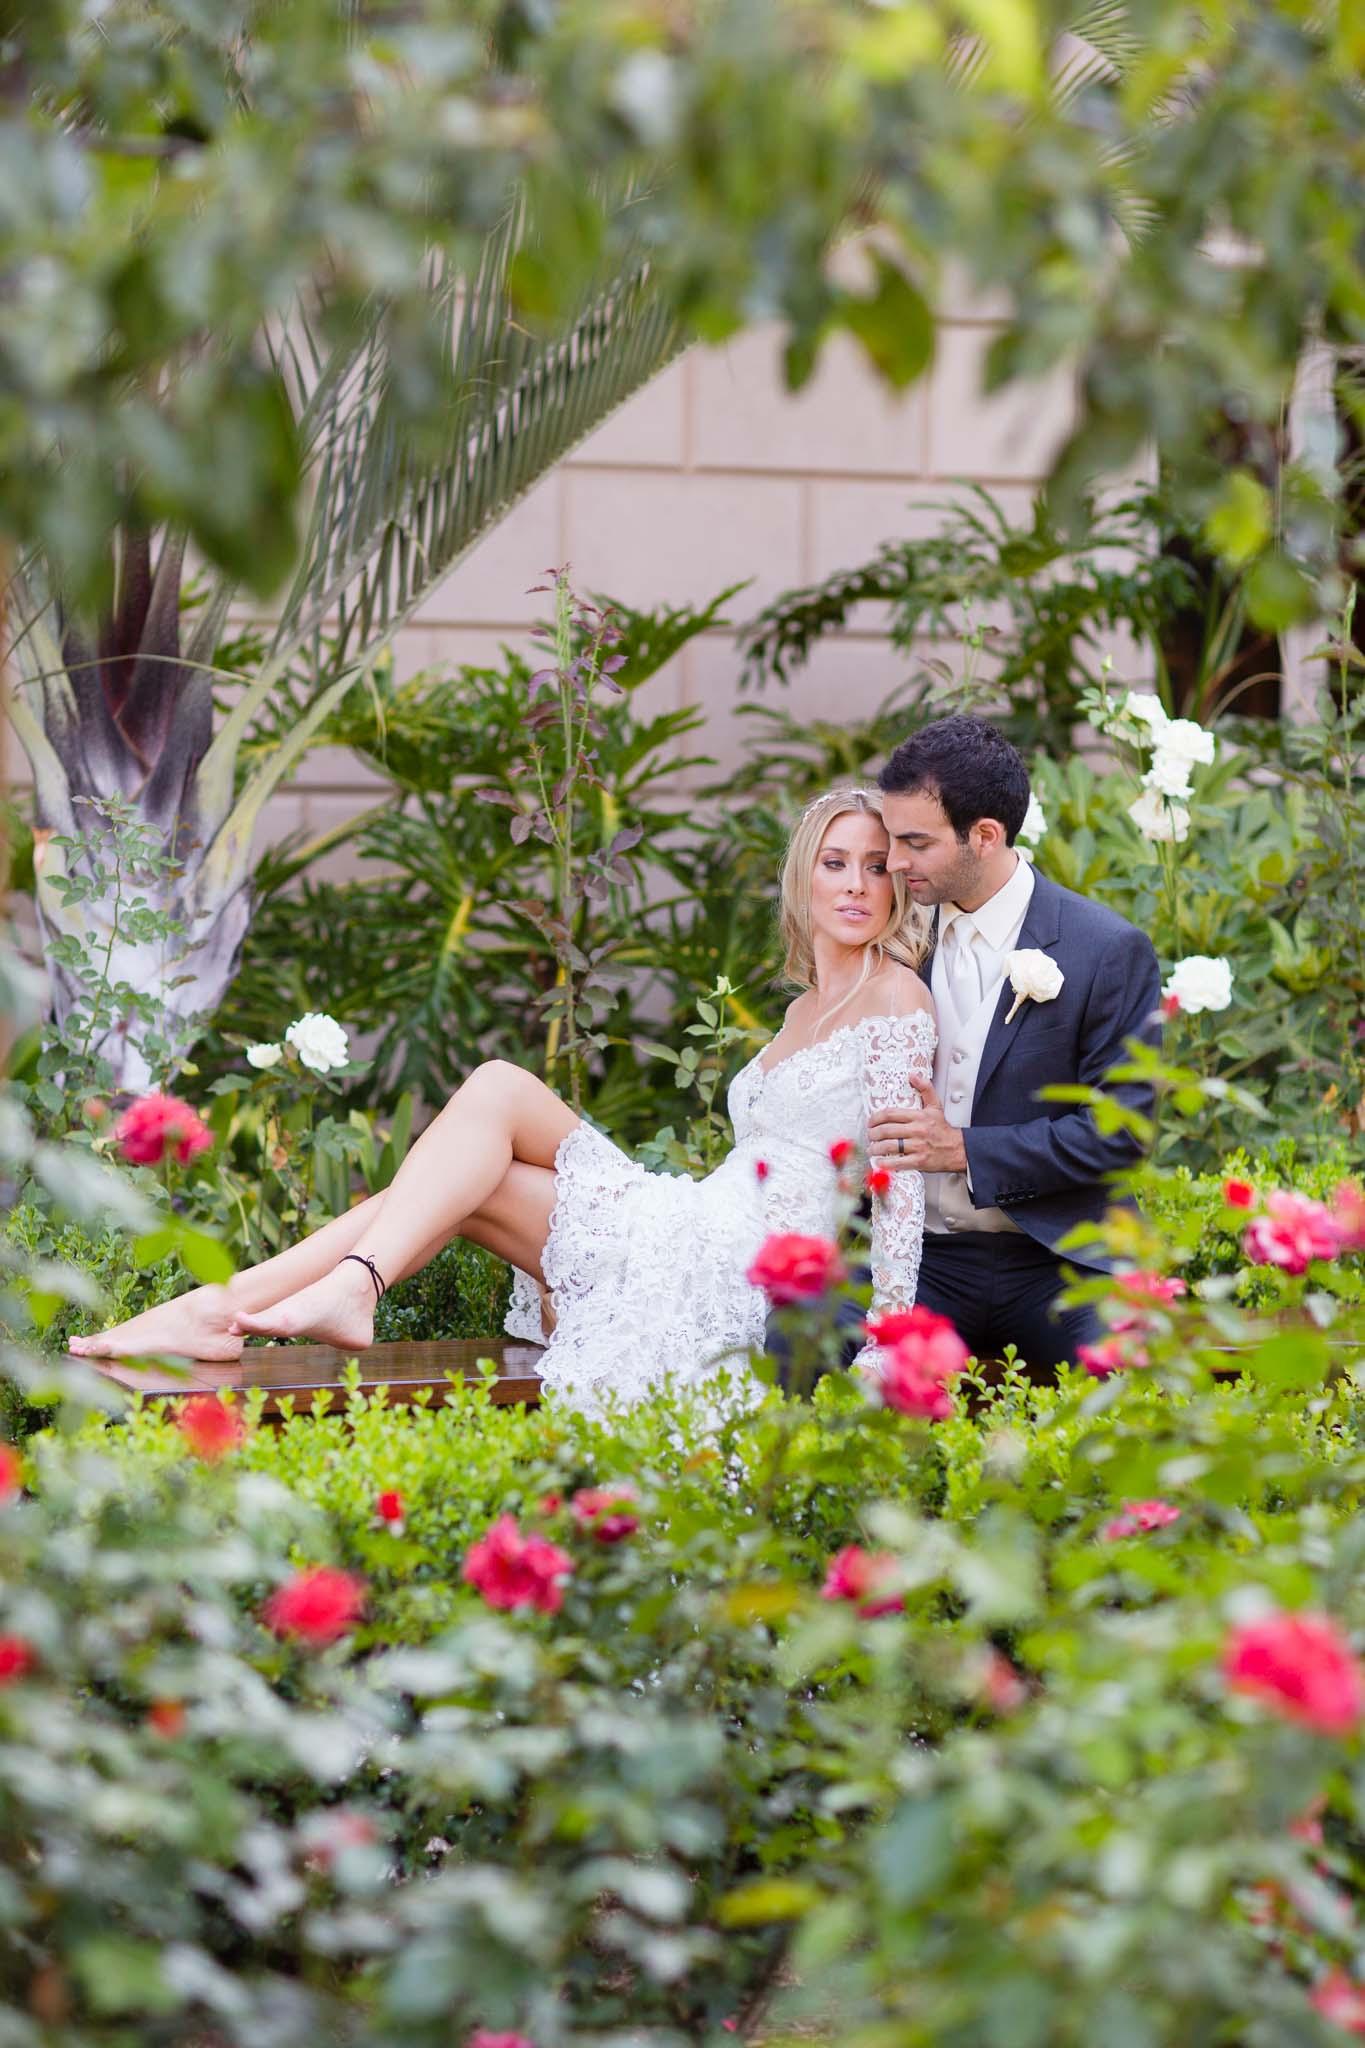 rancho_santa_fe_estate_wedding_098.jpg